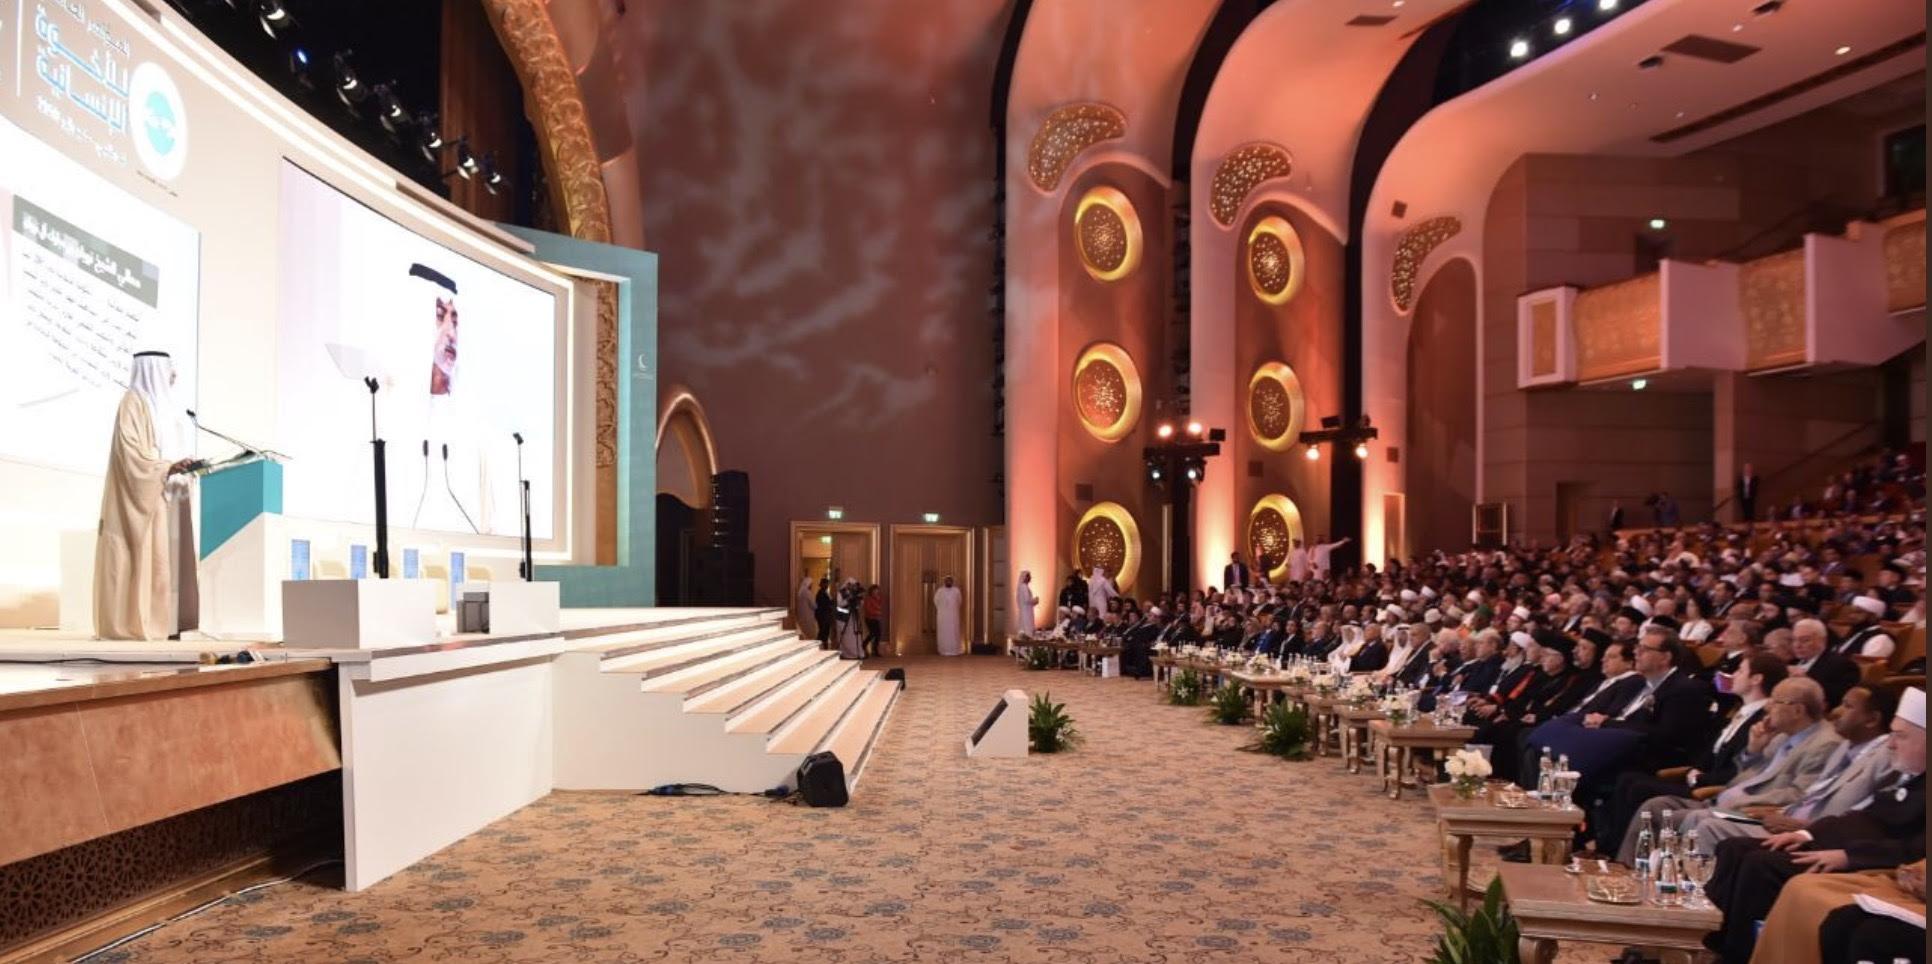 Ci sono 500 leader religiosi riuniti ad Abu Dhabi